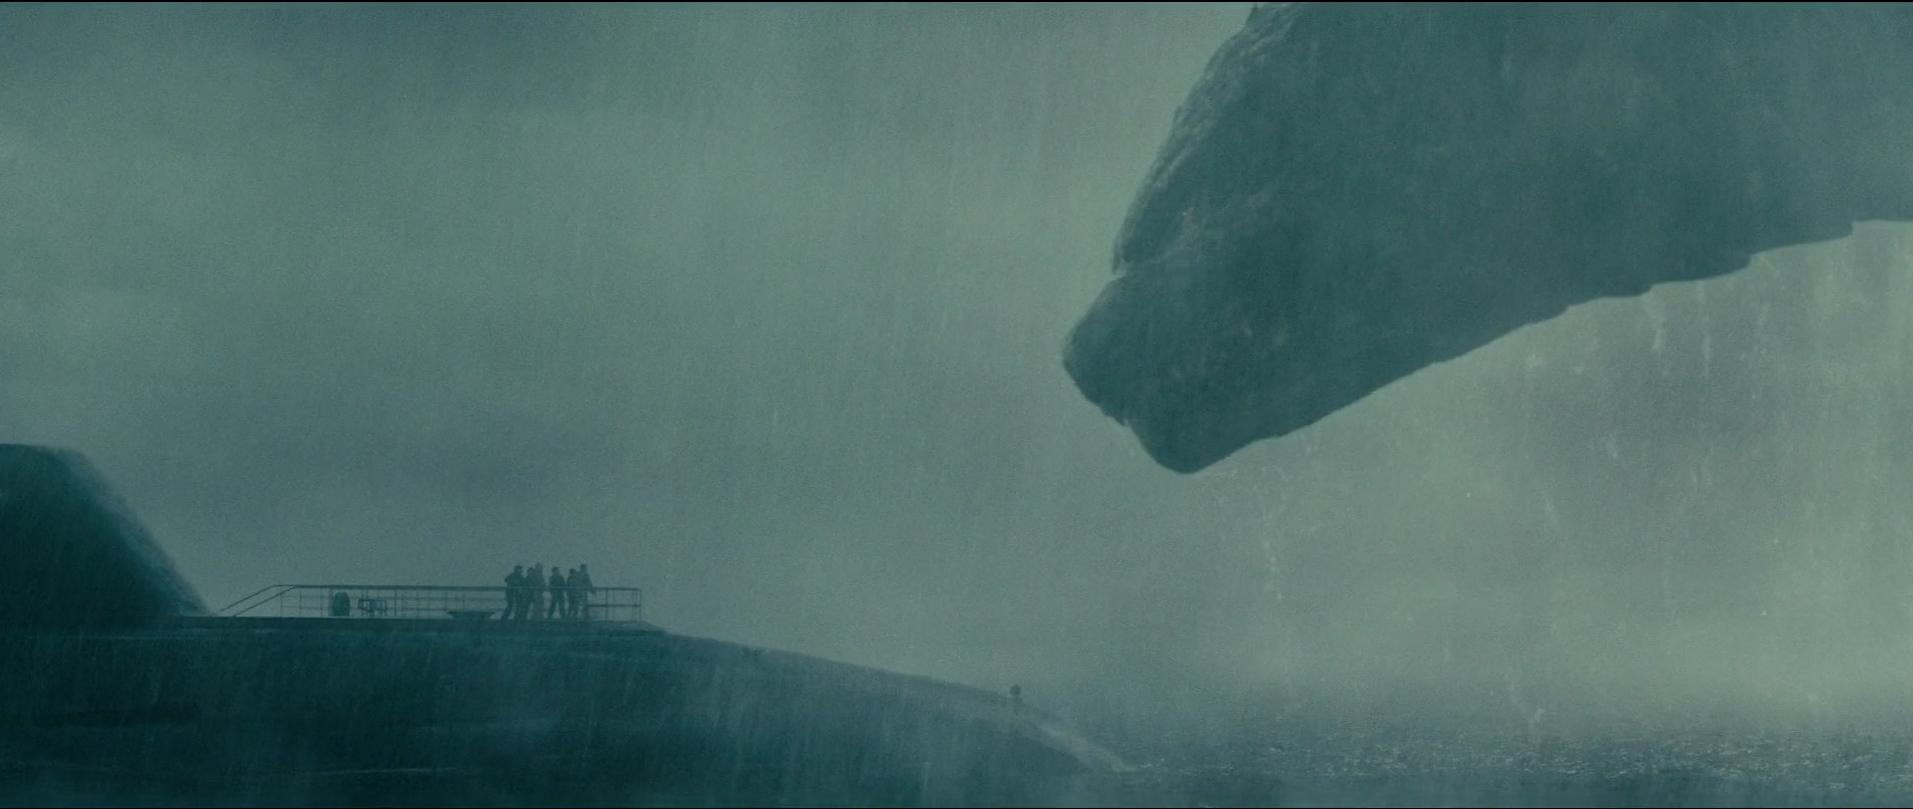 25 Godzilla says hello.png